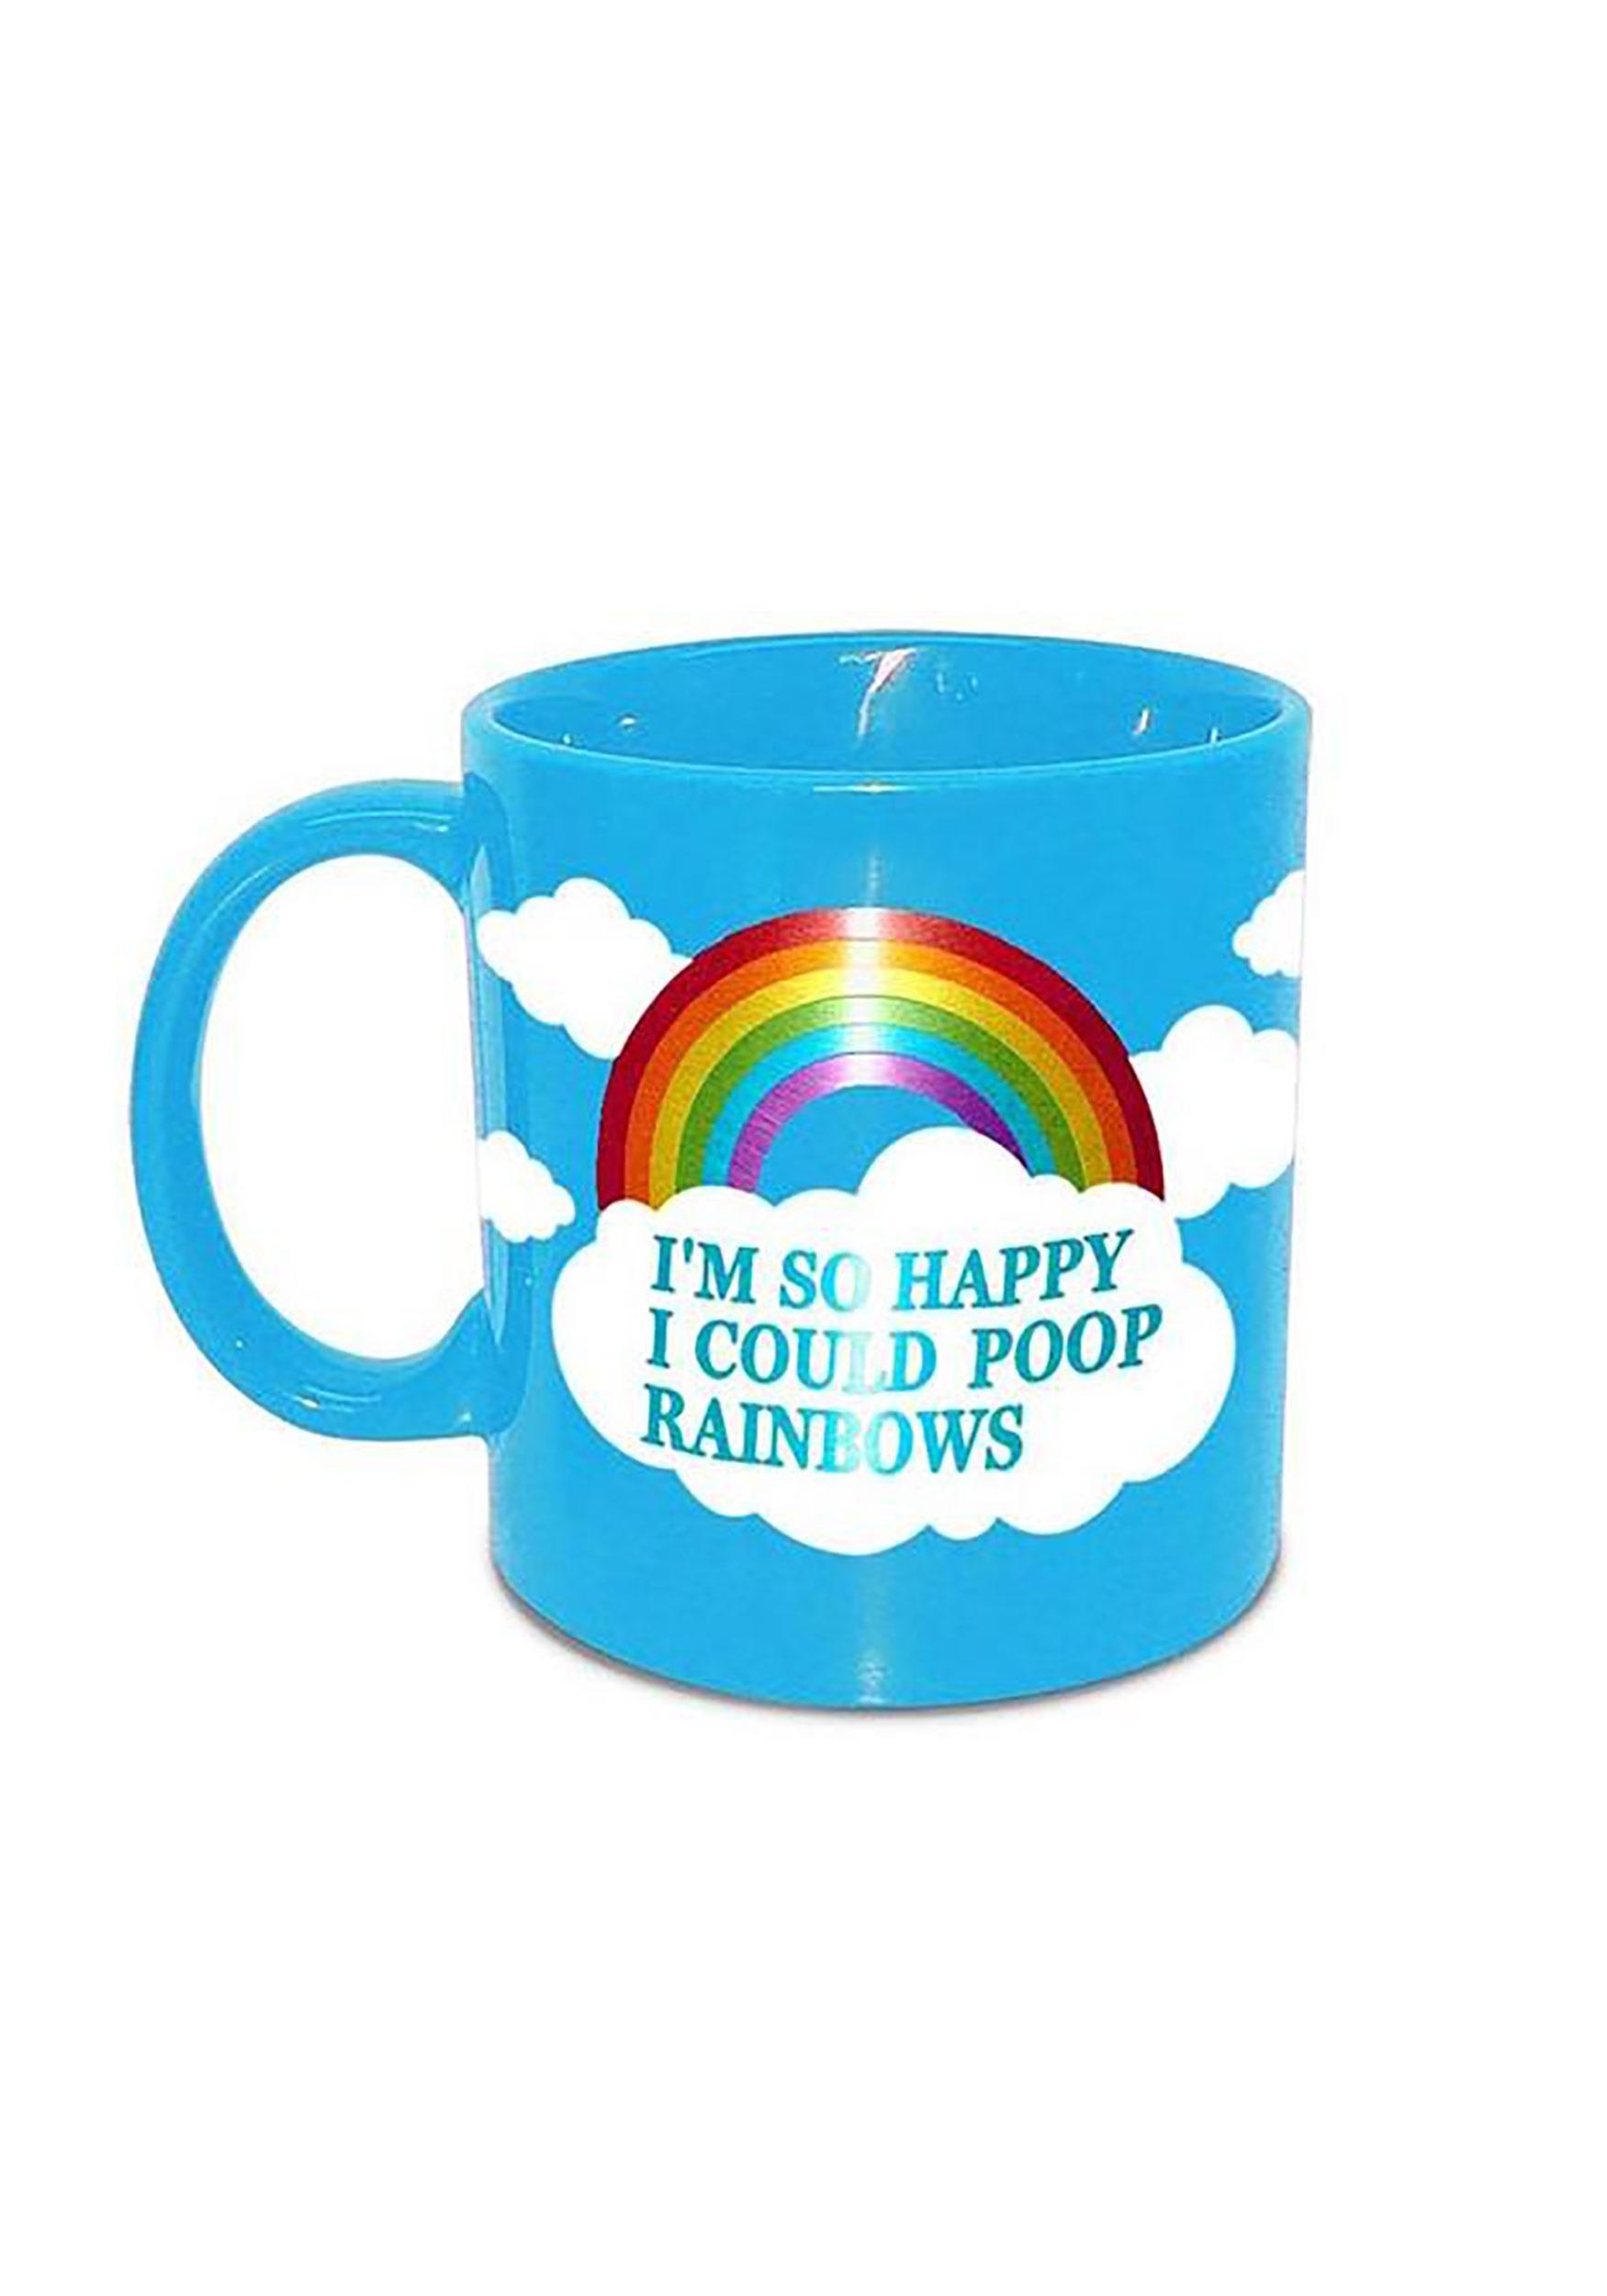 I'm So Happy I Could Poop Rainbows Coffee Mug